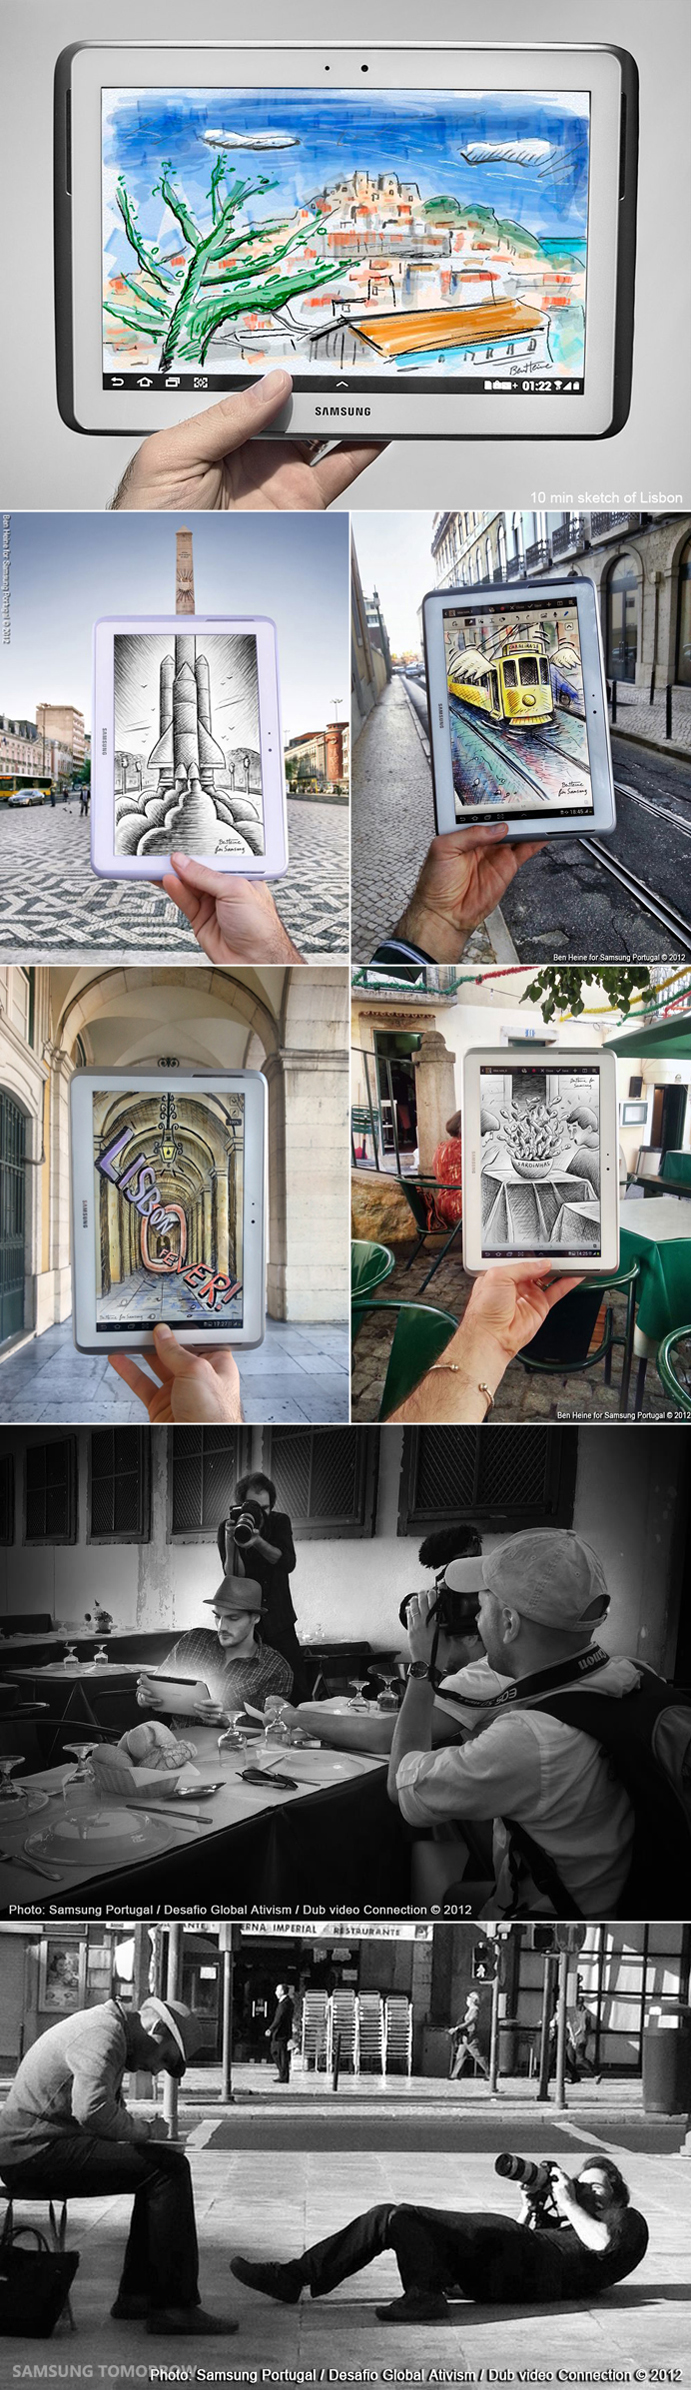 Fusing-Art-and-Technology_4